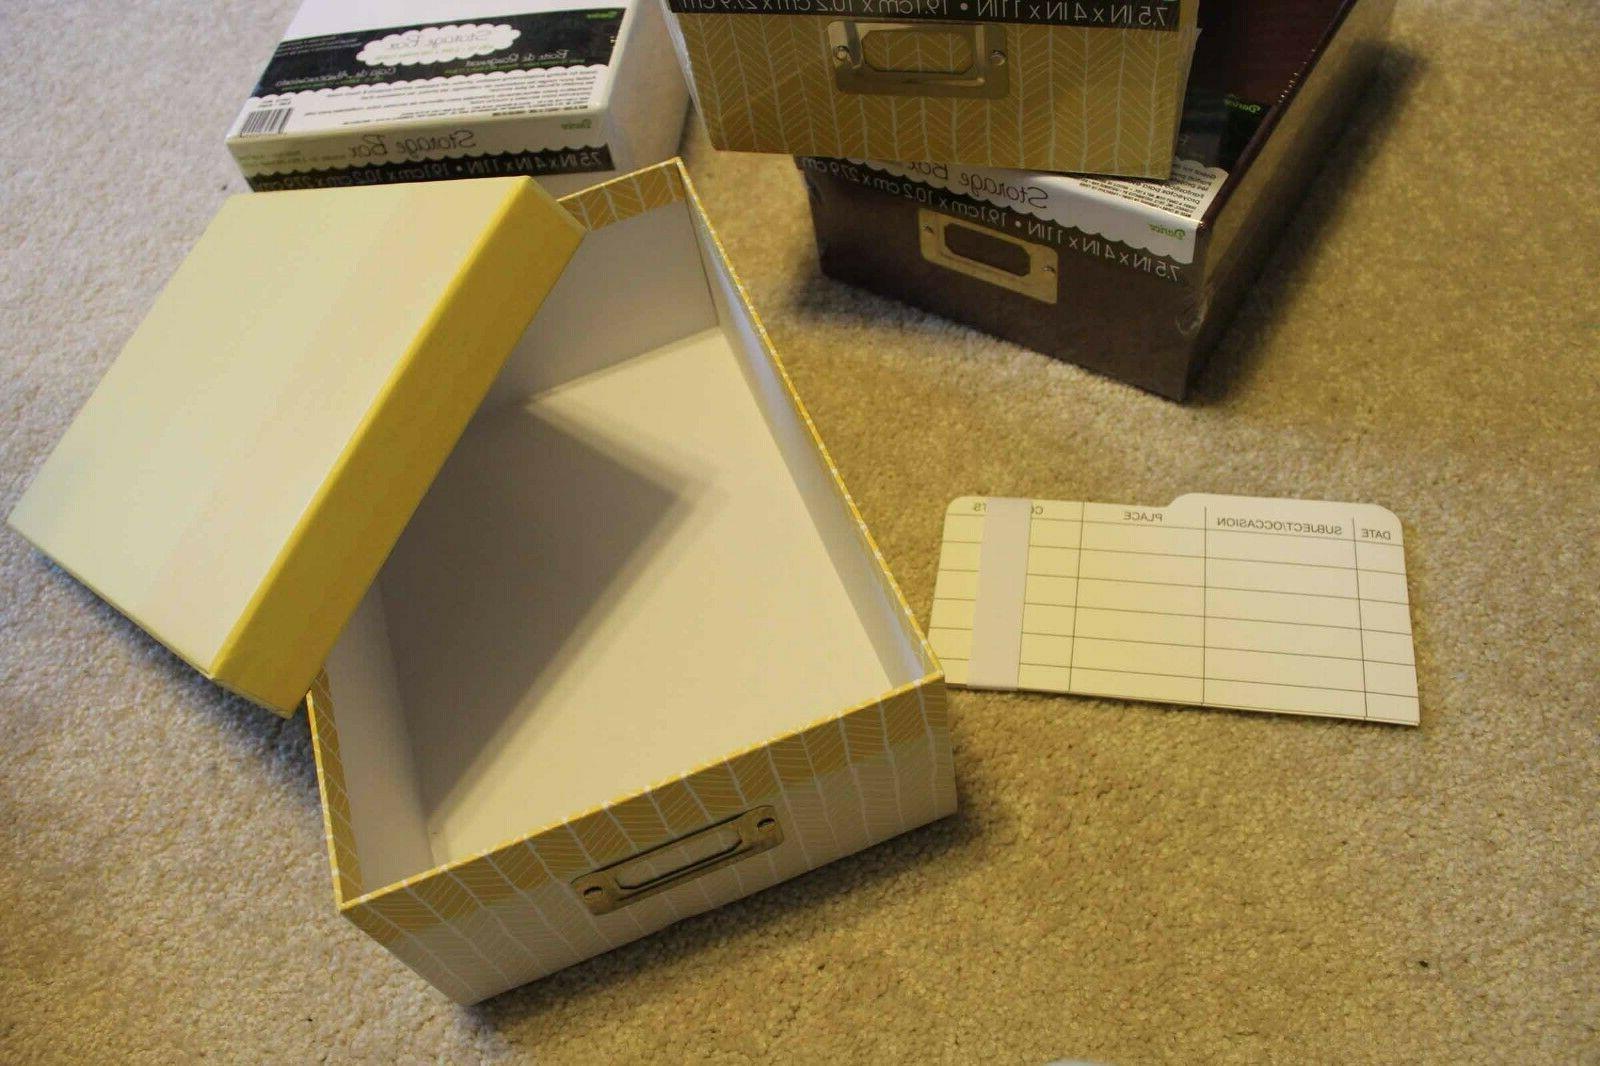 Darice Storage Plain tan yellow Paper 7.5 x 4 x